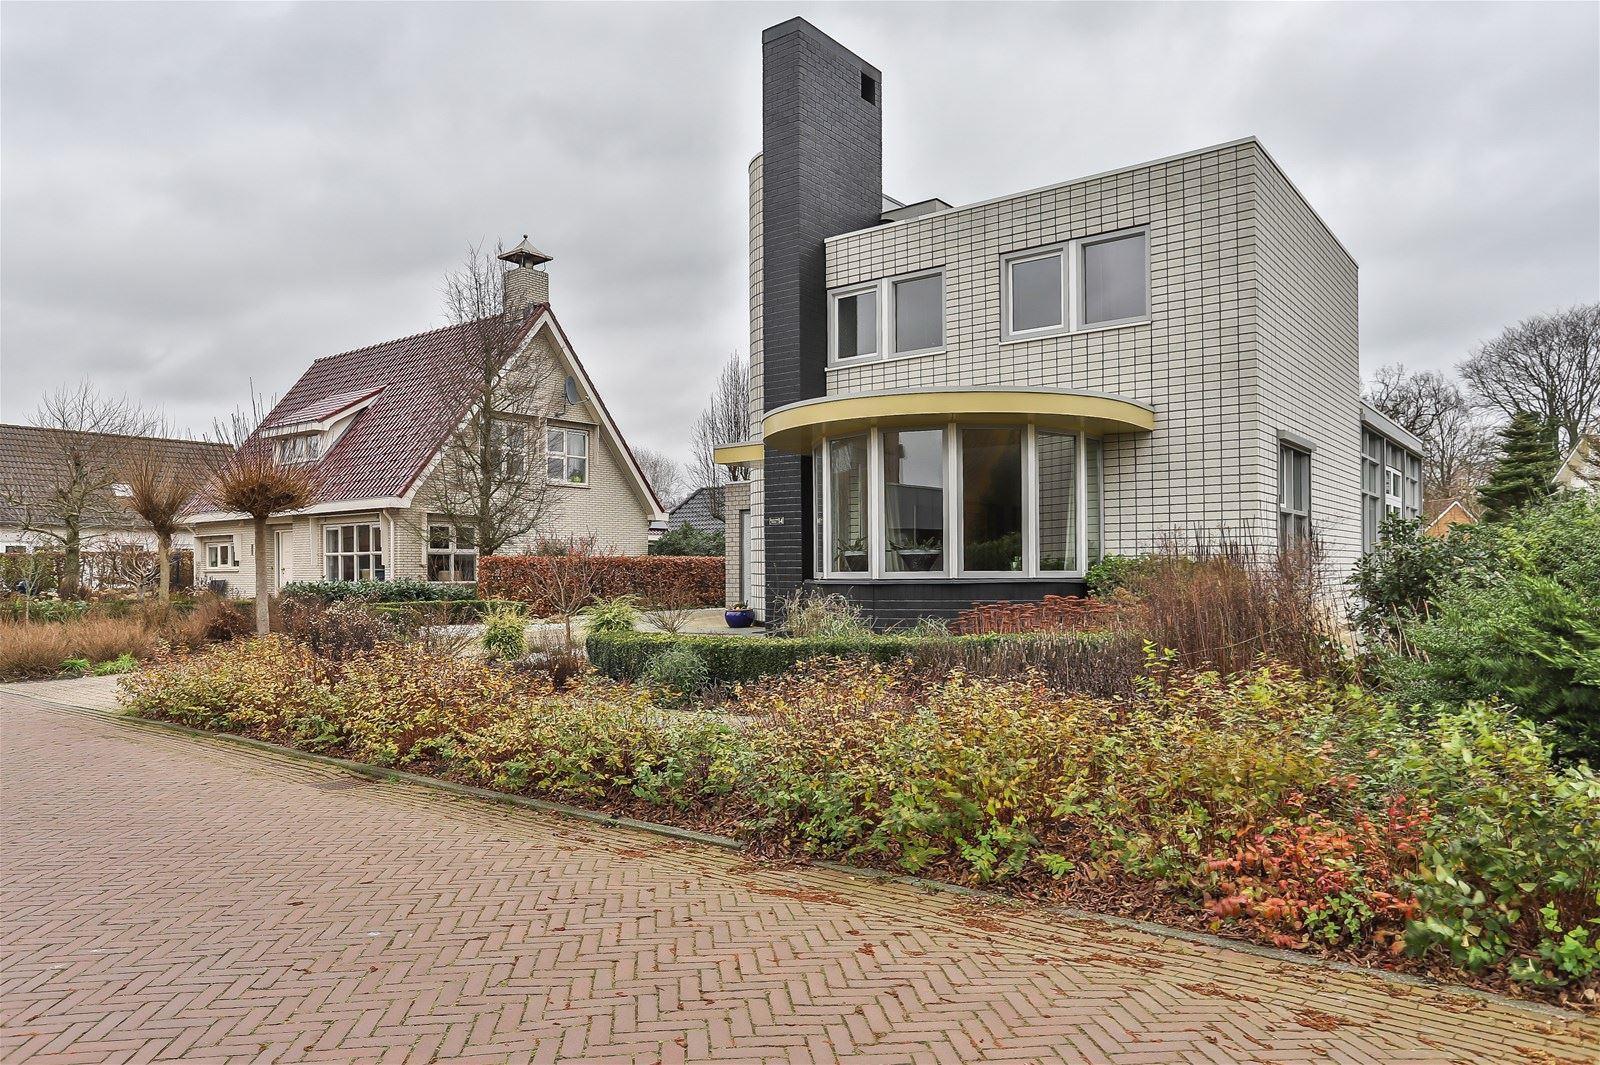 Verkocht: Pastorietuin 14 9617 EE Harkstede (Gem. Midden ...